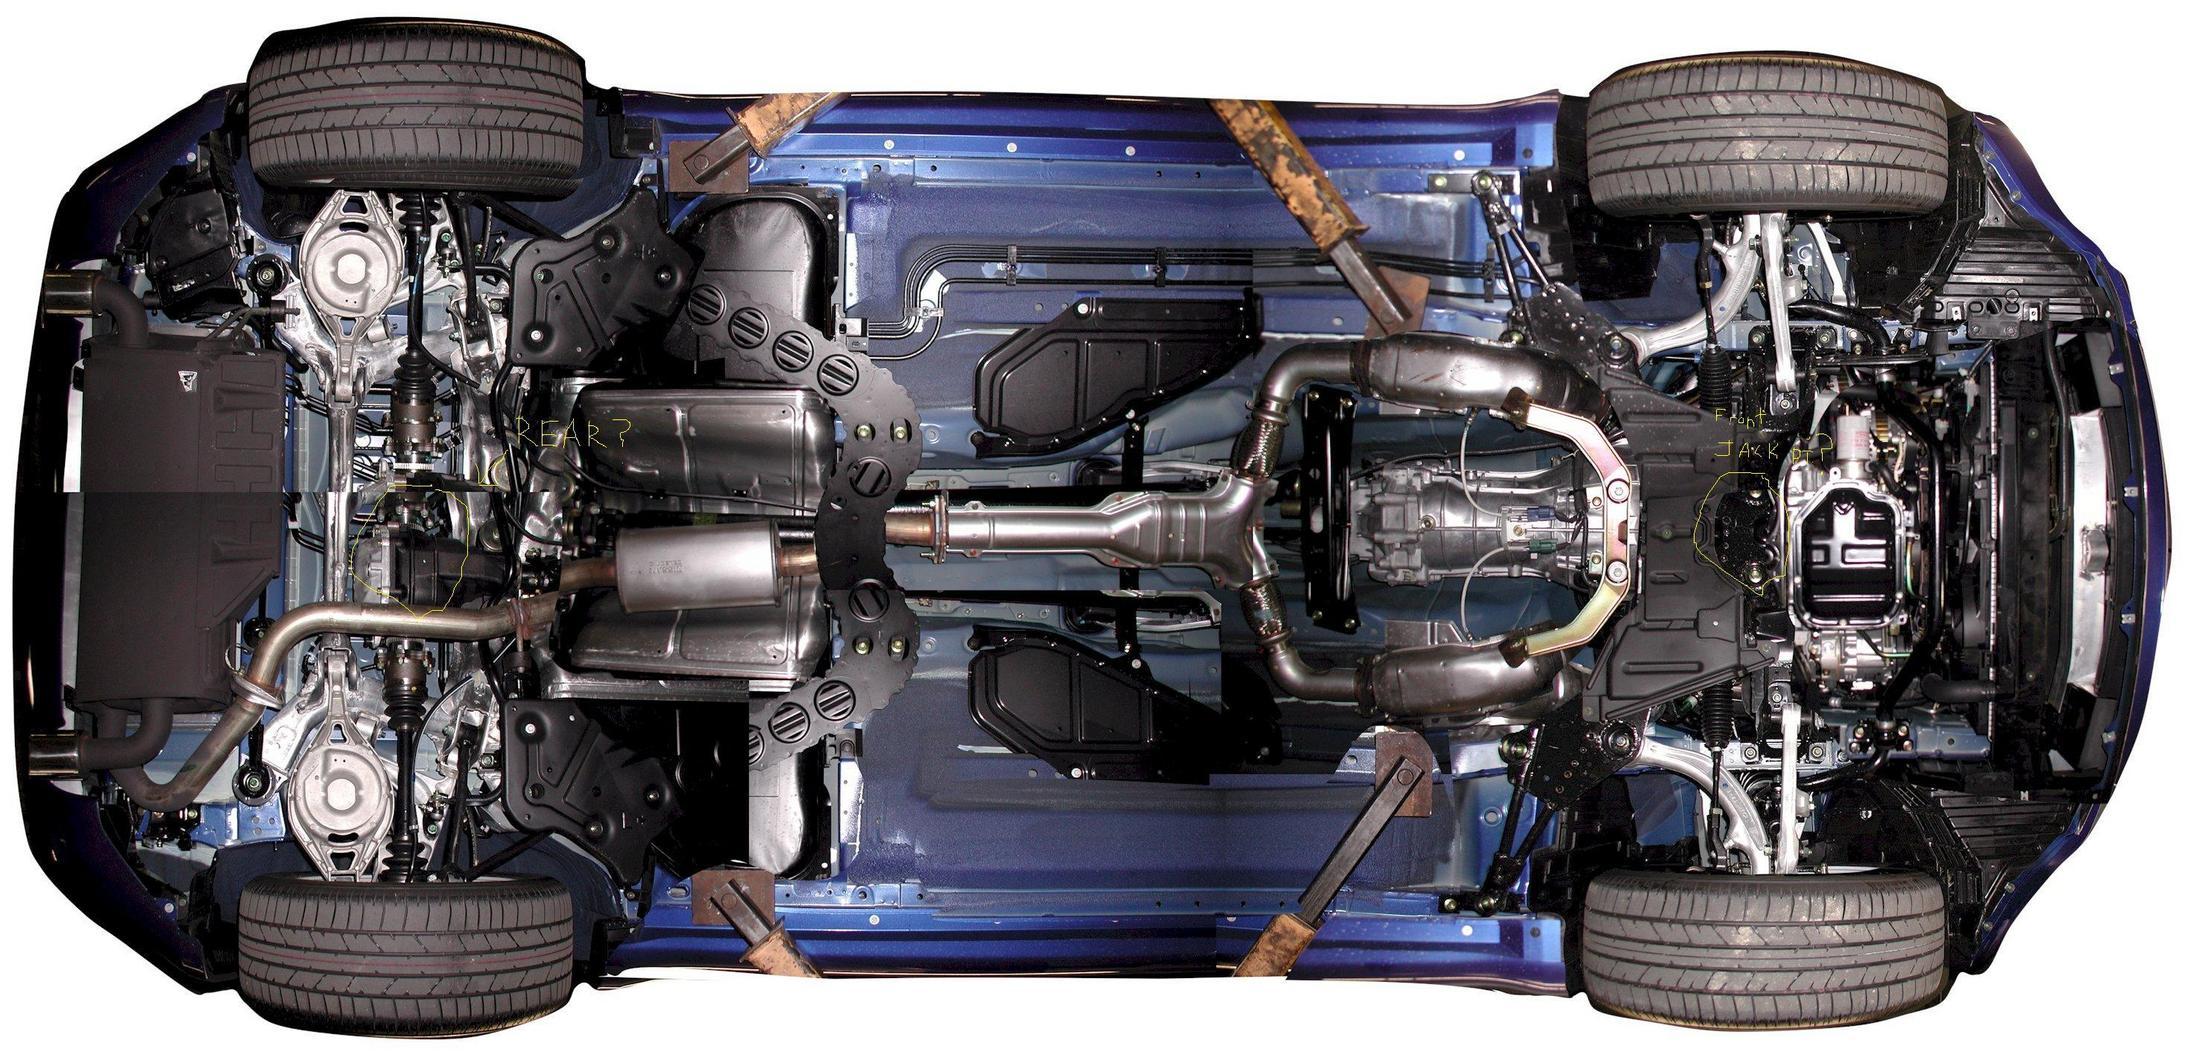 F150 Body Lift Stock Wheels